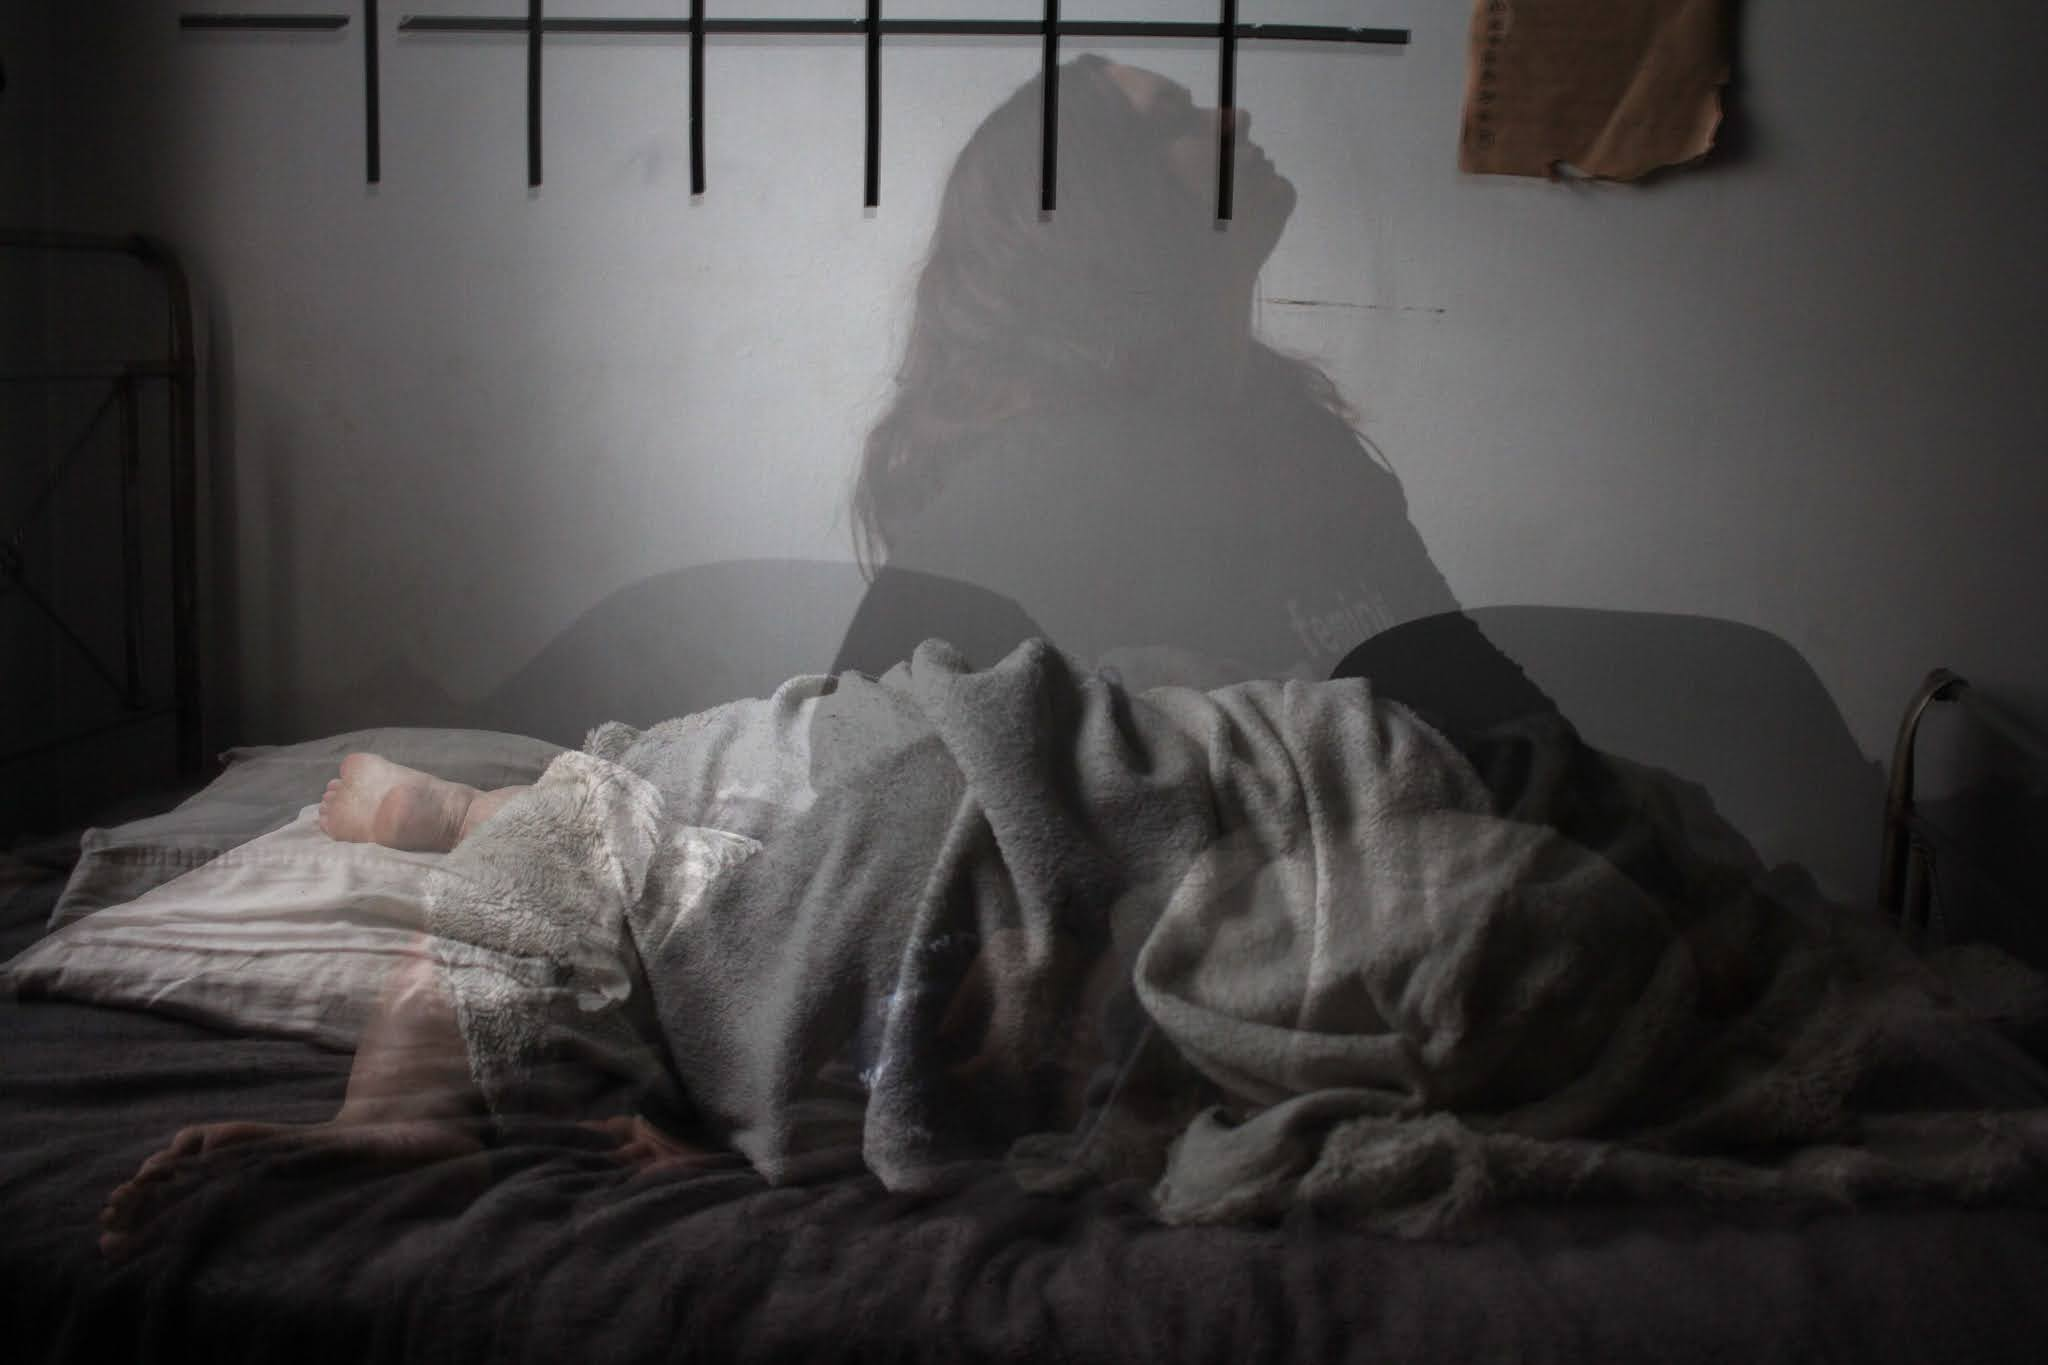 Understanding Somniphobia The Fear Of Sleep